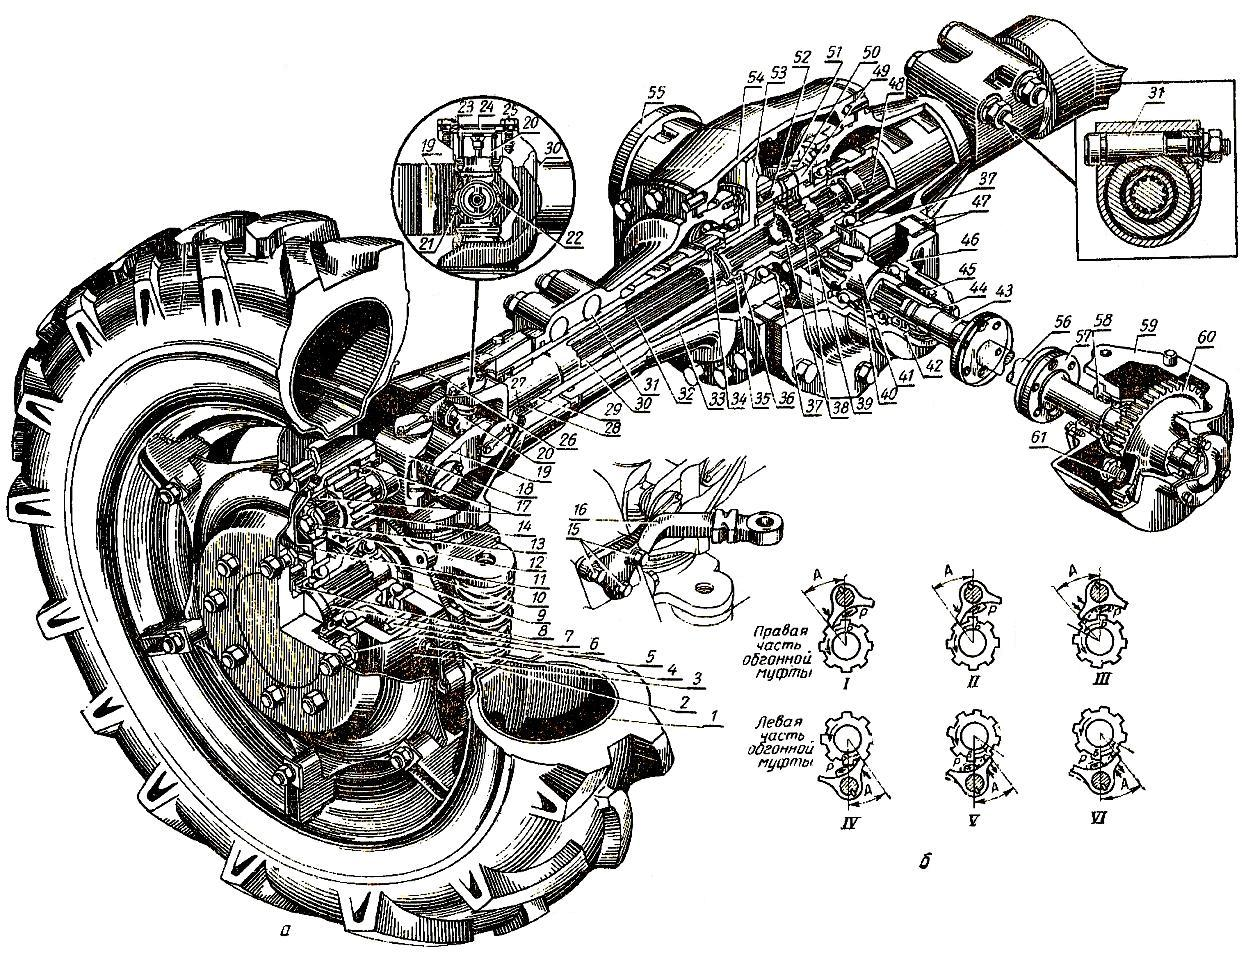 Корпус сальника мтз 82 старого образца | Корпус сальника.